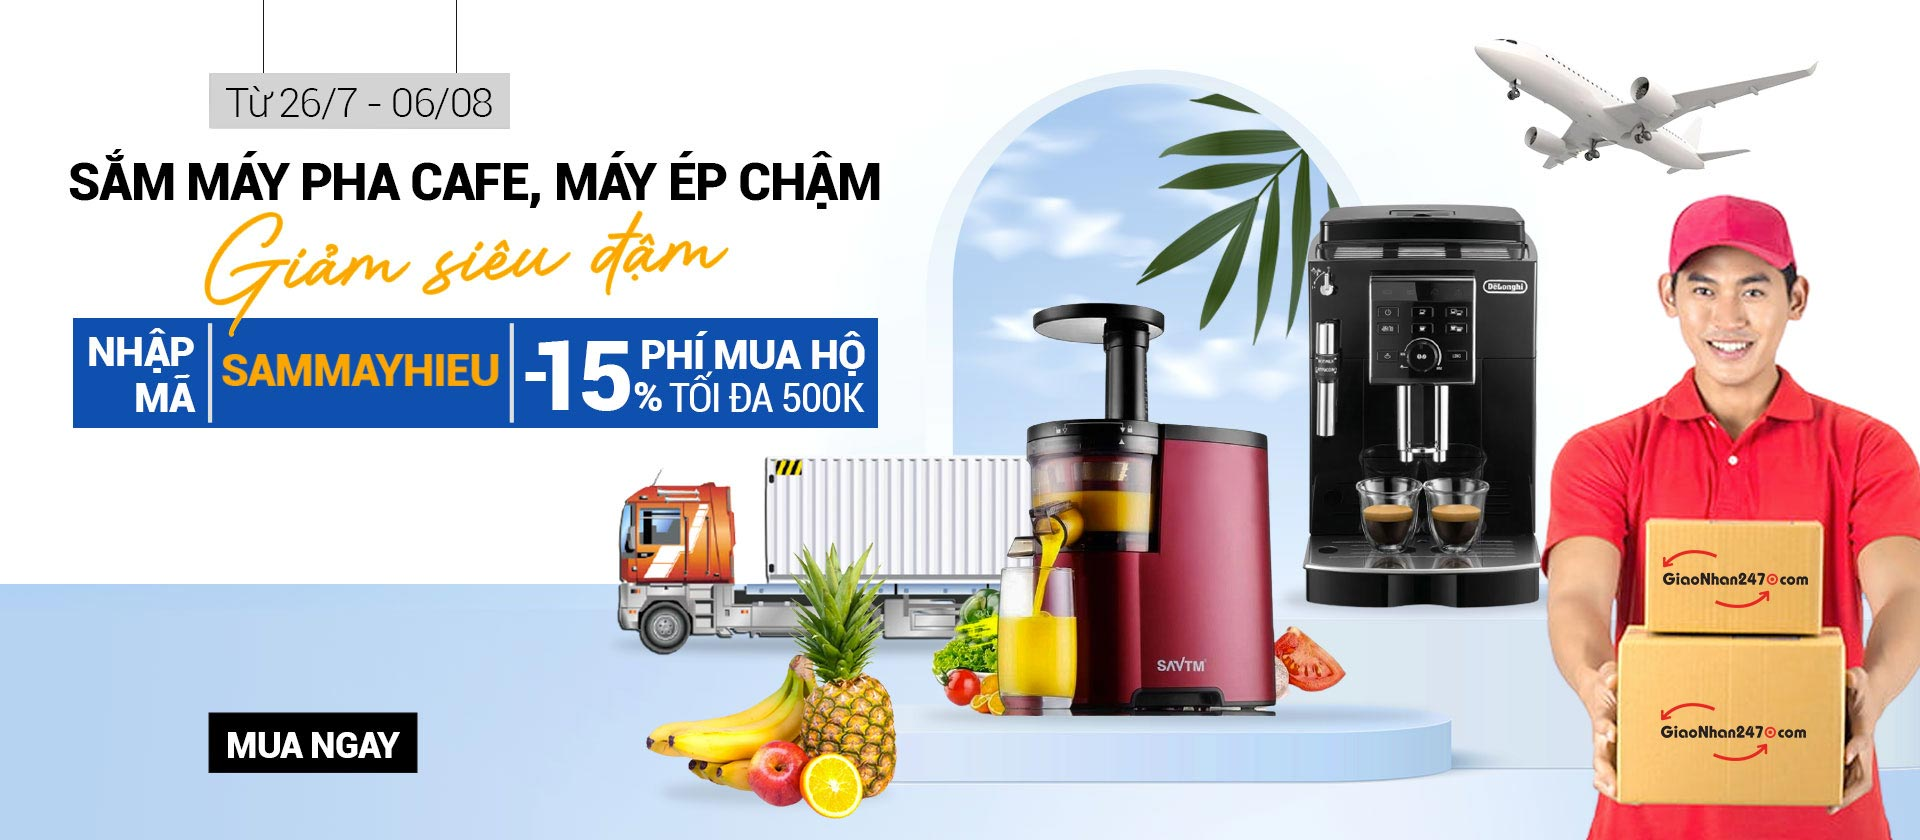 nhan-mua-ho-may-ep-cham-pha-cafe